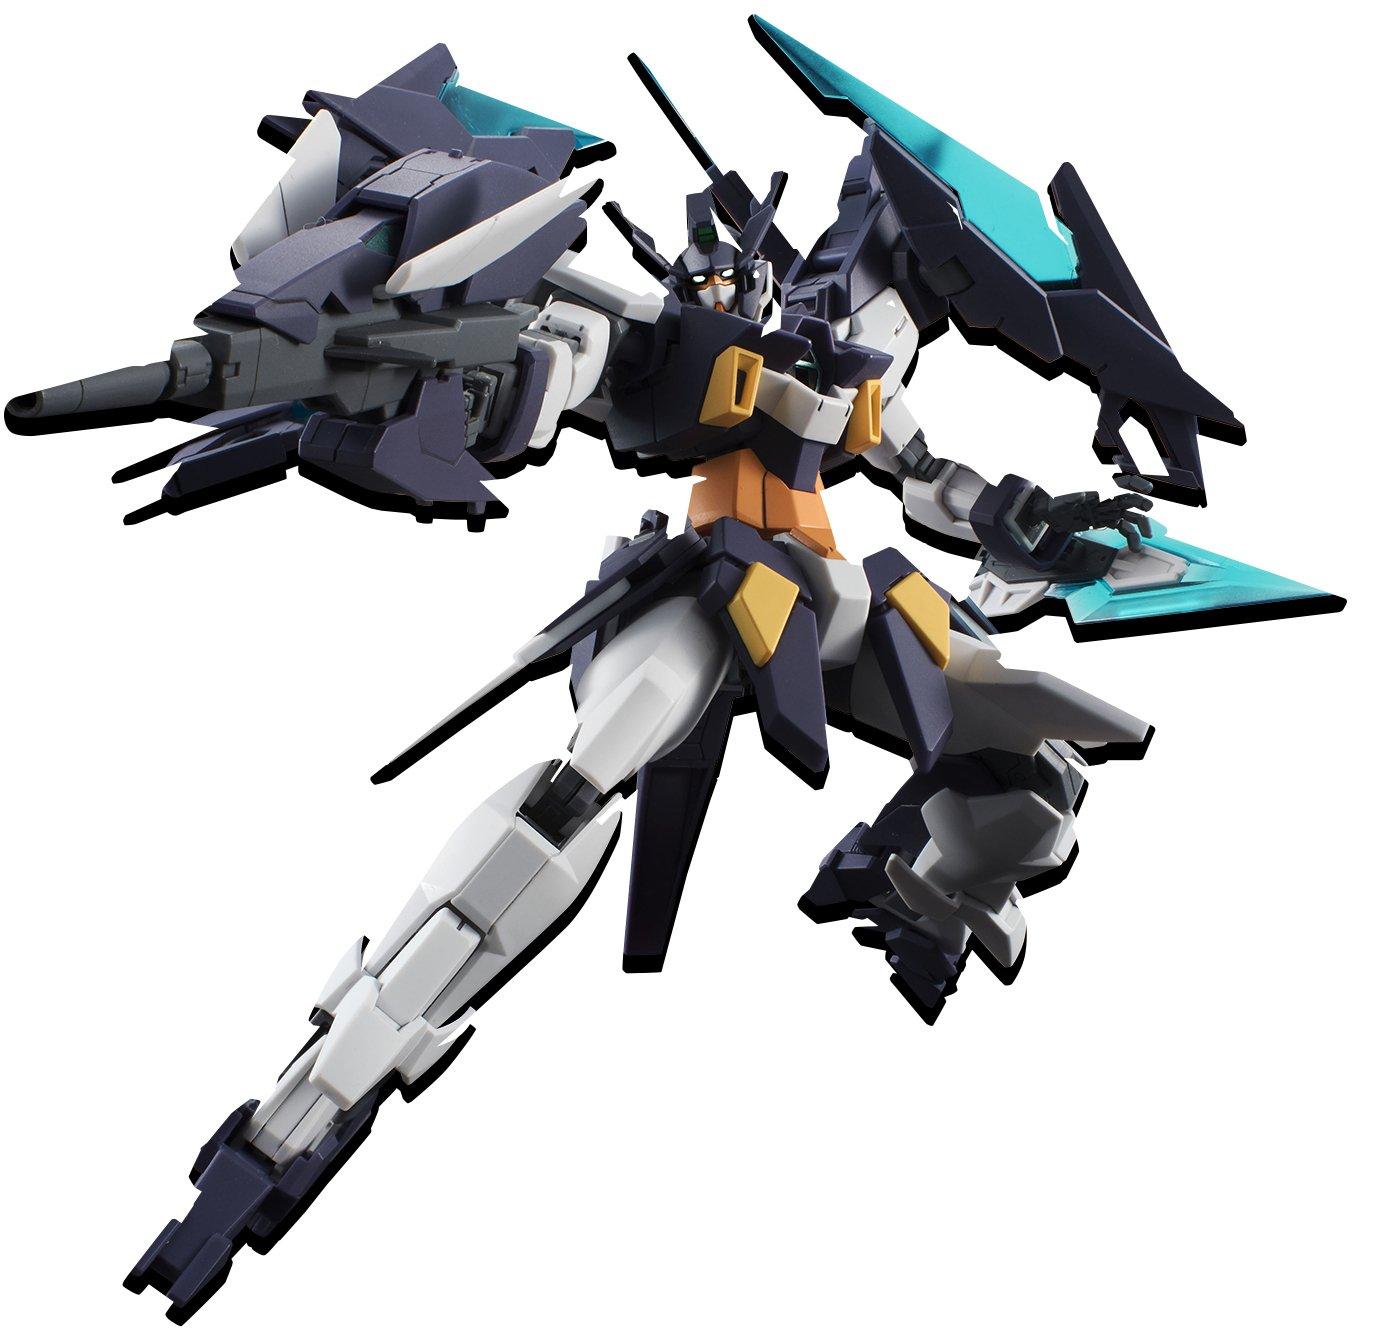 Bandai HGBD 1/144 Gundam AGEII Magnum Plastic Kit: Amazon.de: Spielzeug